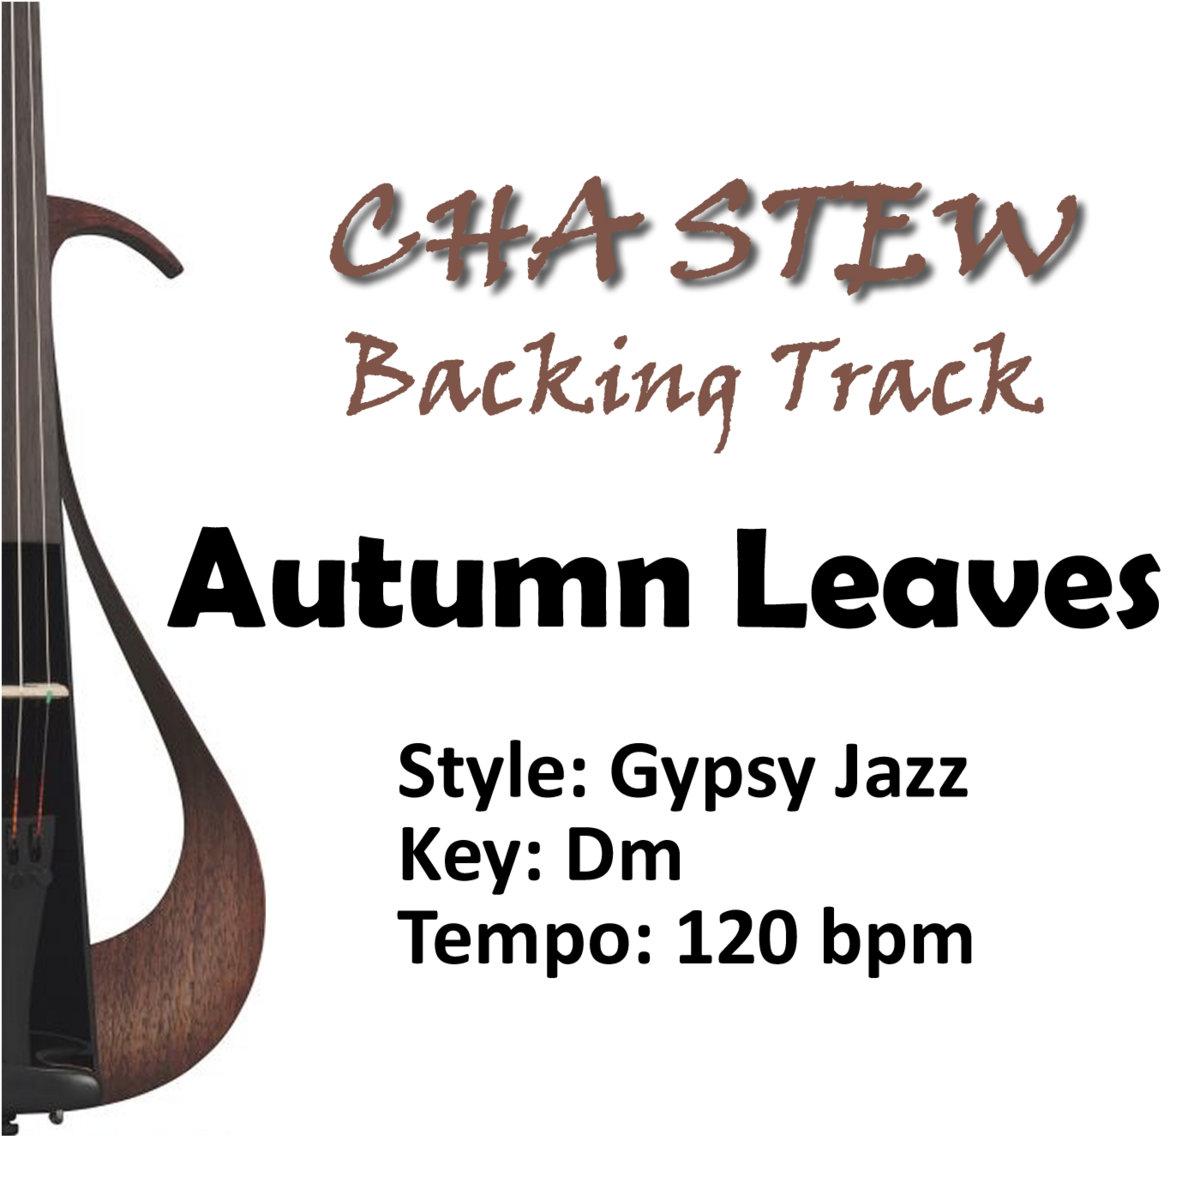 Autumn Leaves (Dm) :: Gypsy Jazz Backing Track | Cha Stew